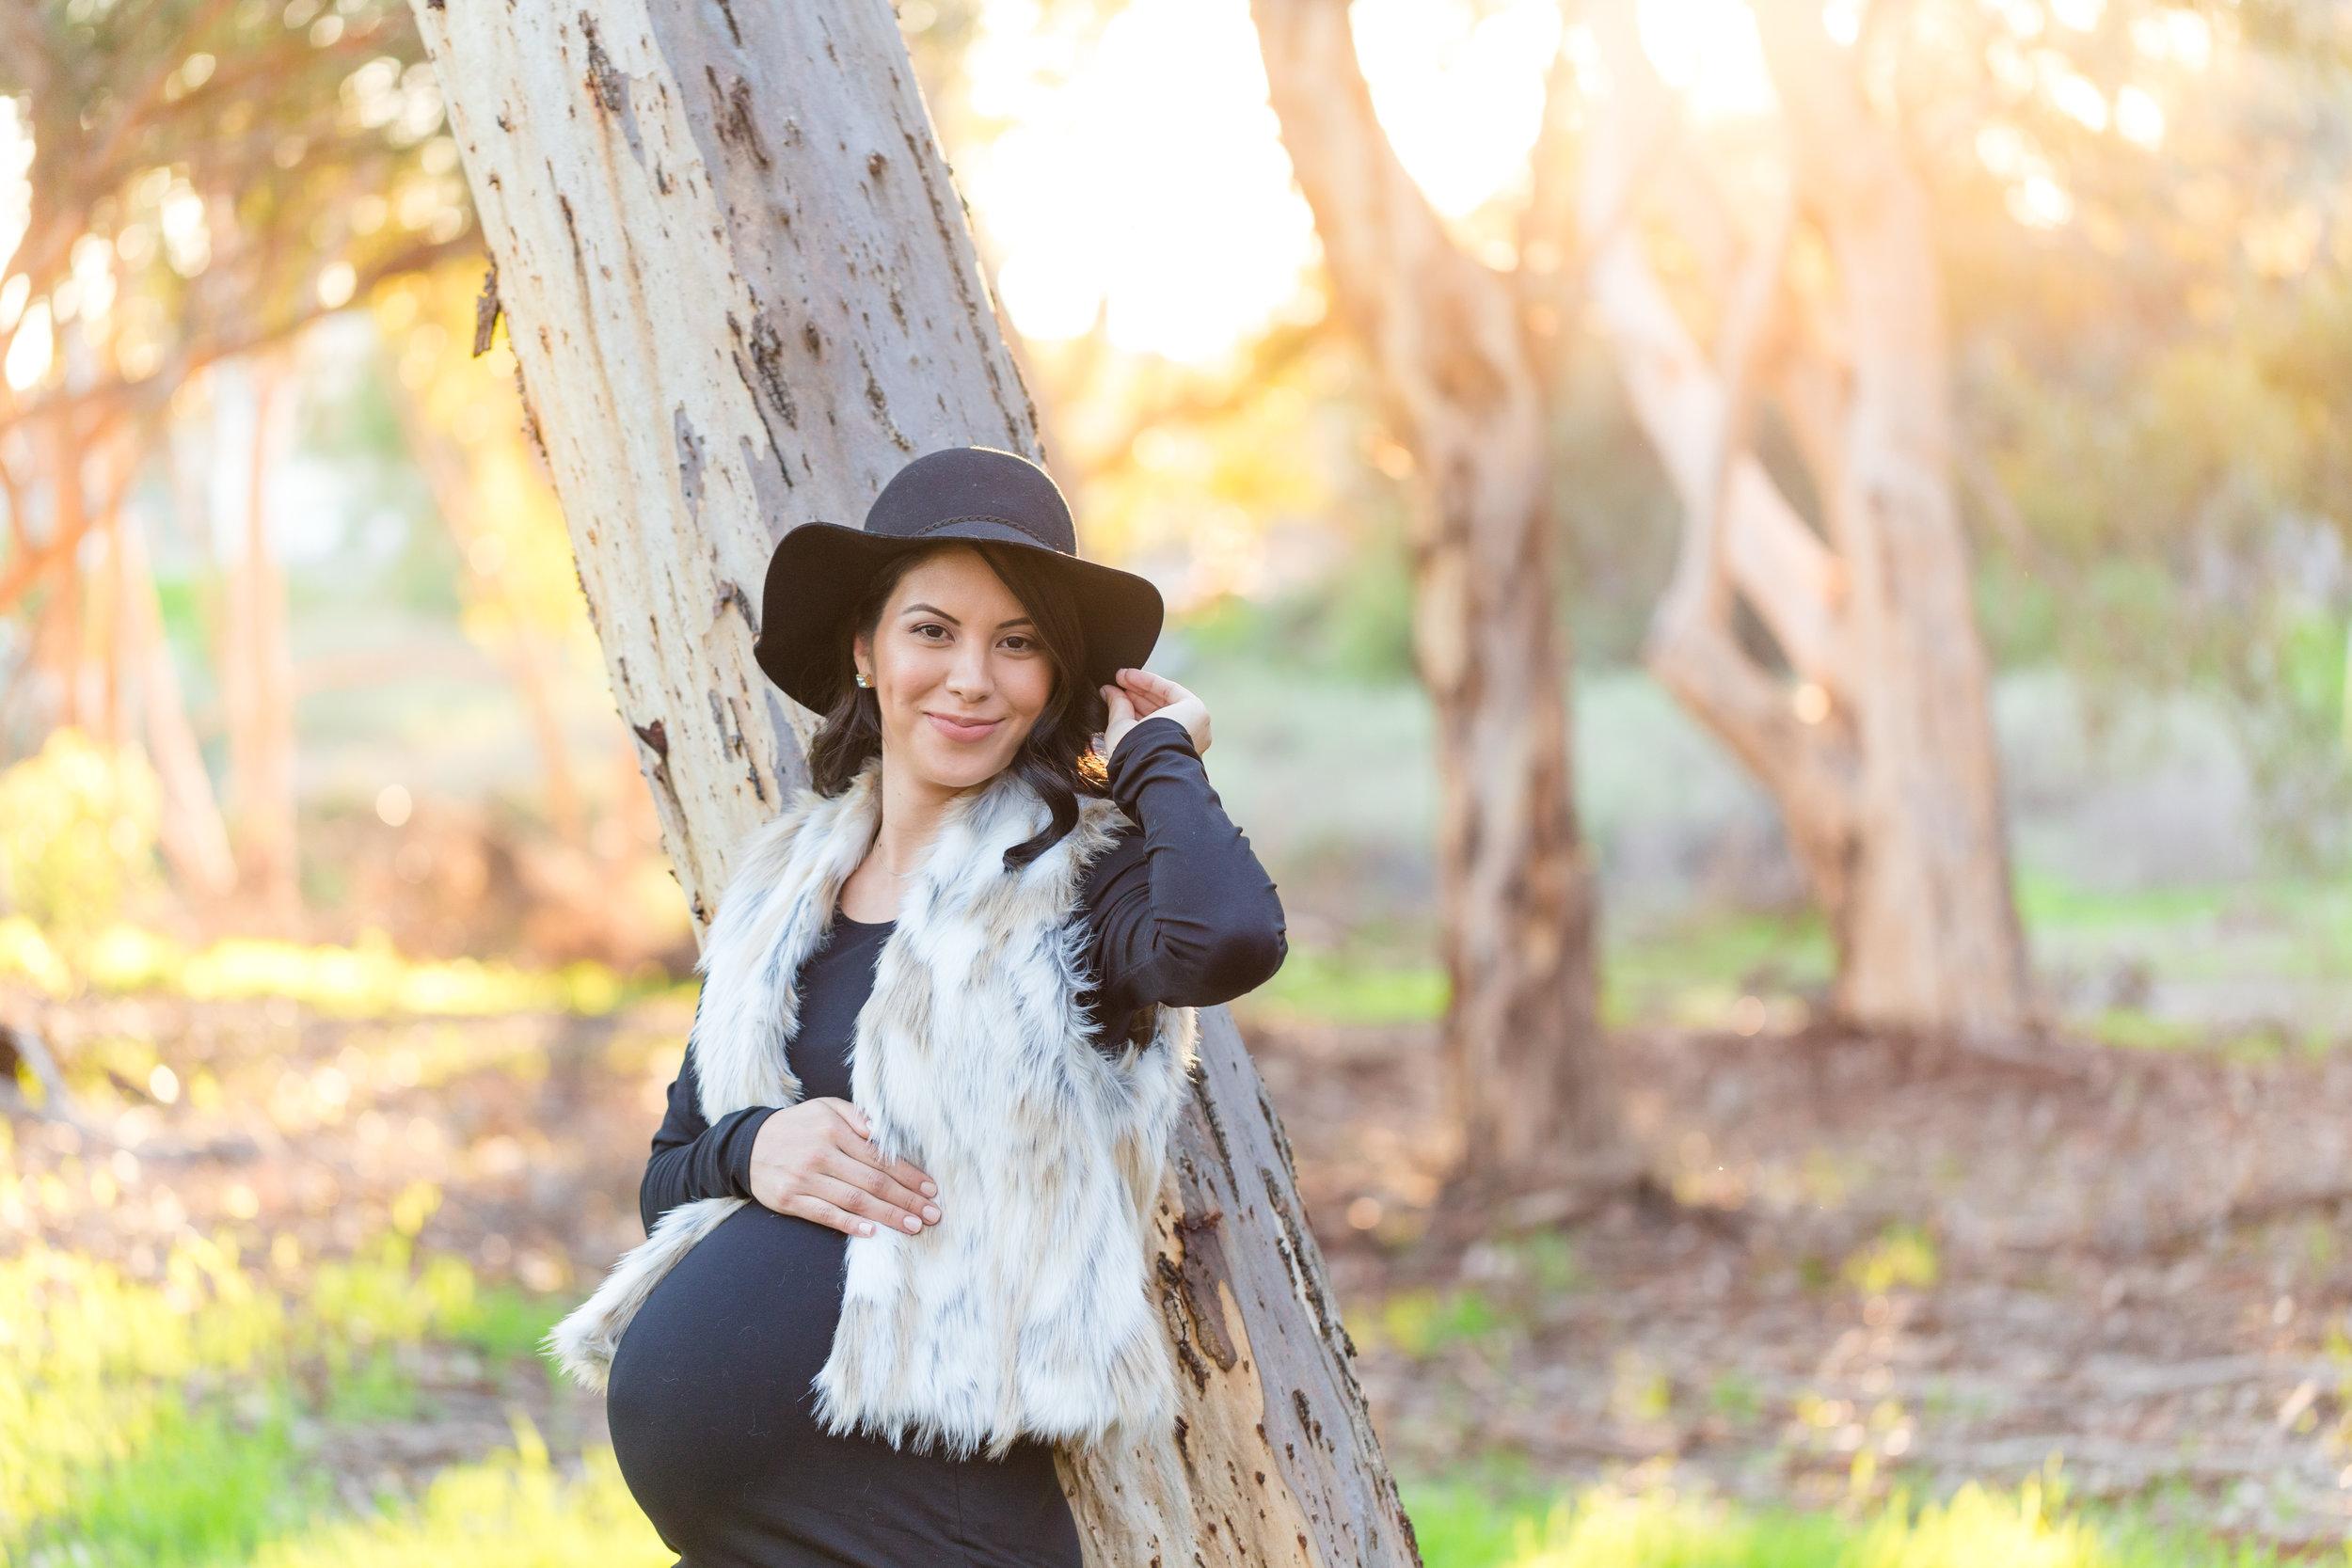 La Jolla Eucalyptus Forest Maternity Session | Winter 2017